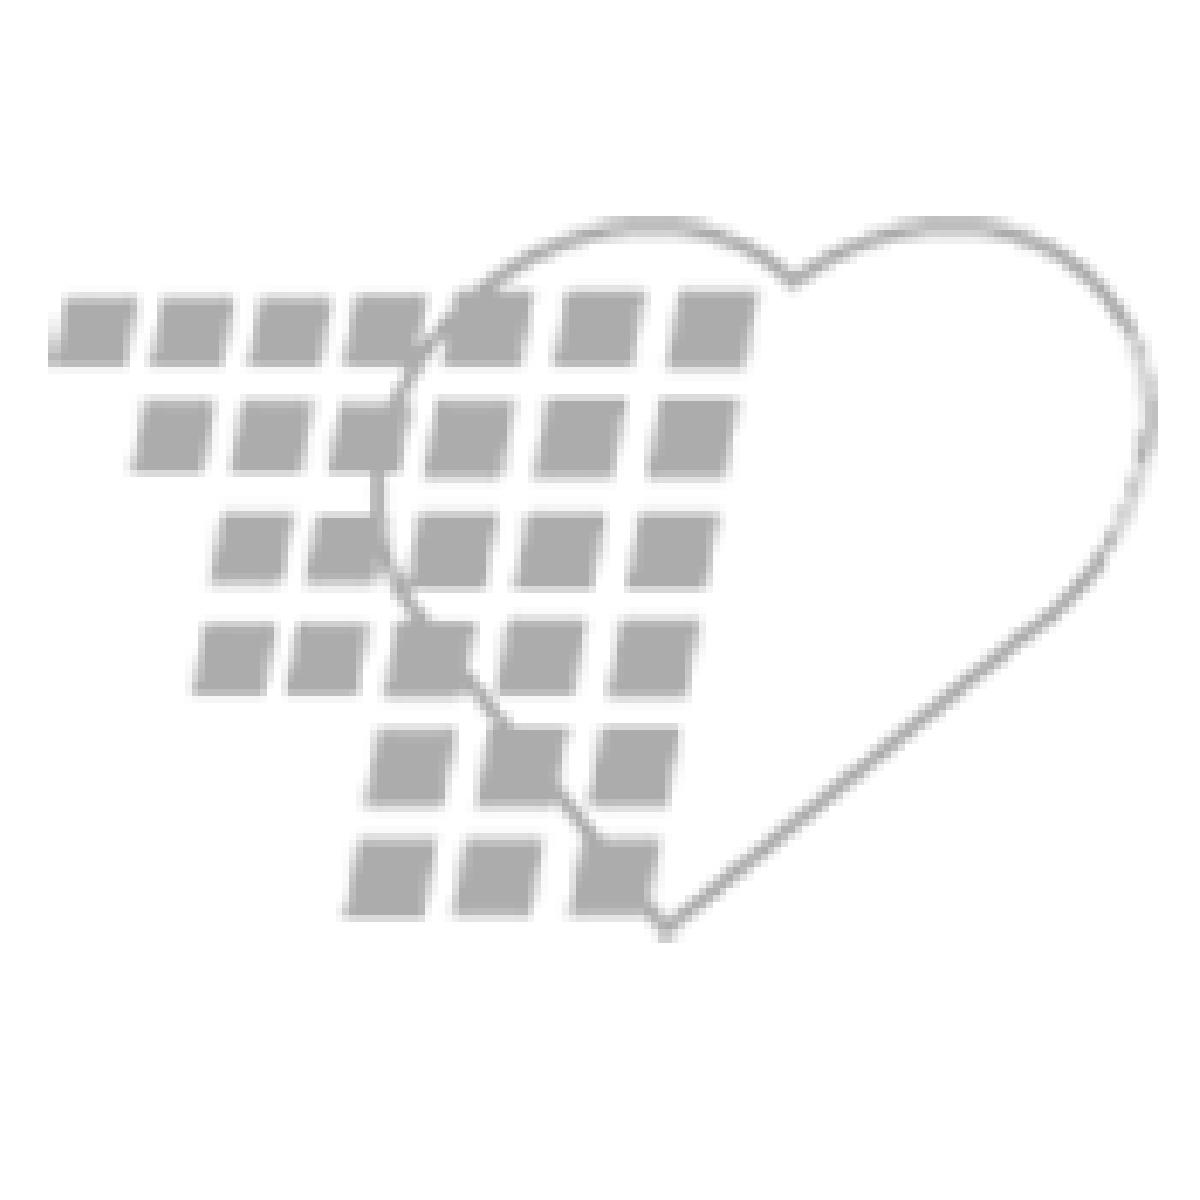 "06-54-1273 - Blood Administration Set Macrobore Prepierced Y-Site 170 Micron Filter Blood Bulb Pumb - 78.5"""